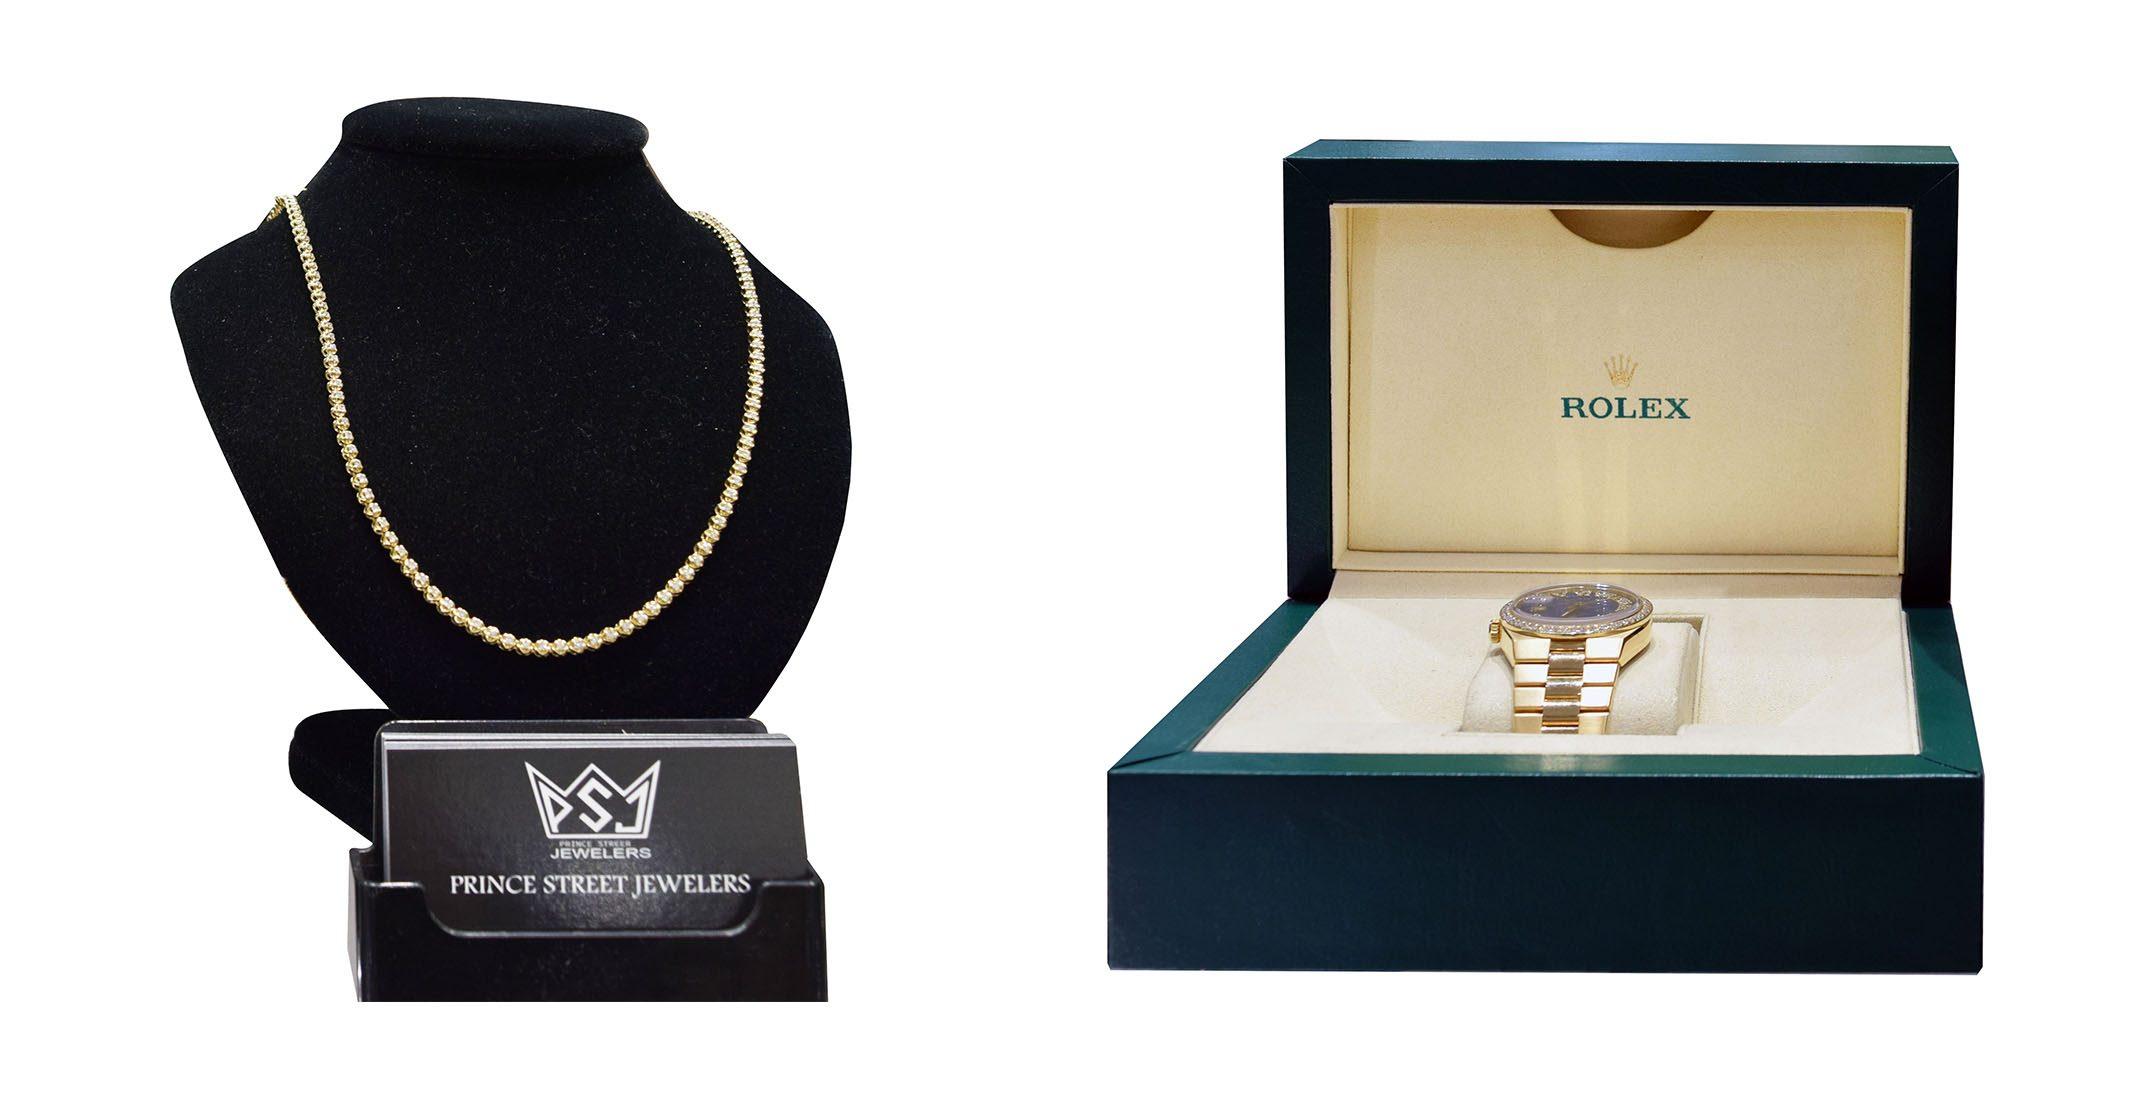 prince-st-jewelers-gifts.jpg#asset:93256